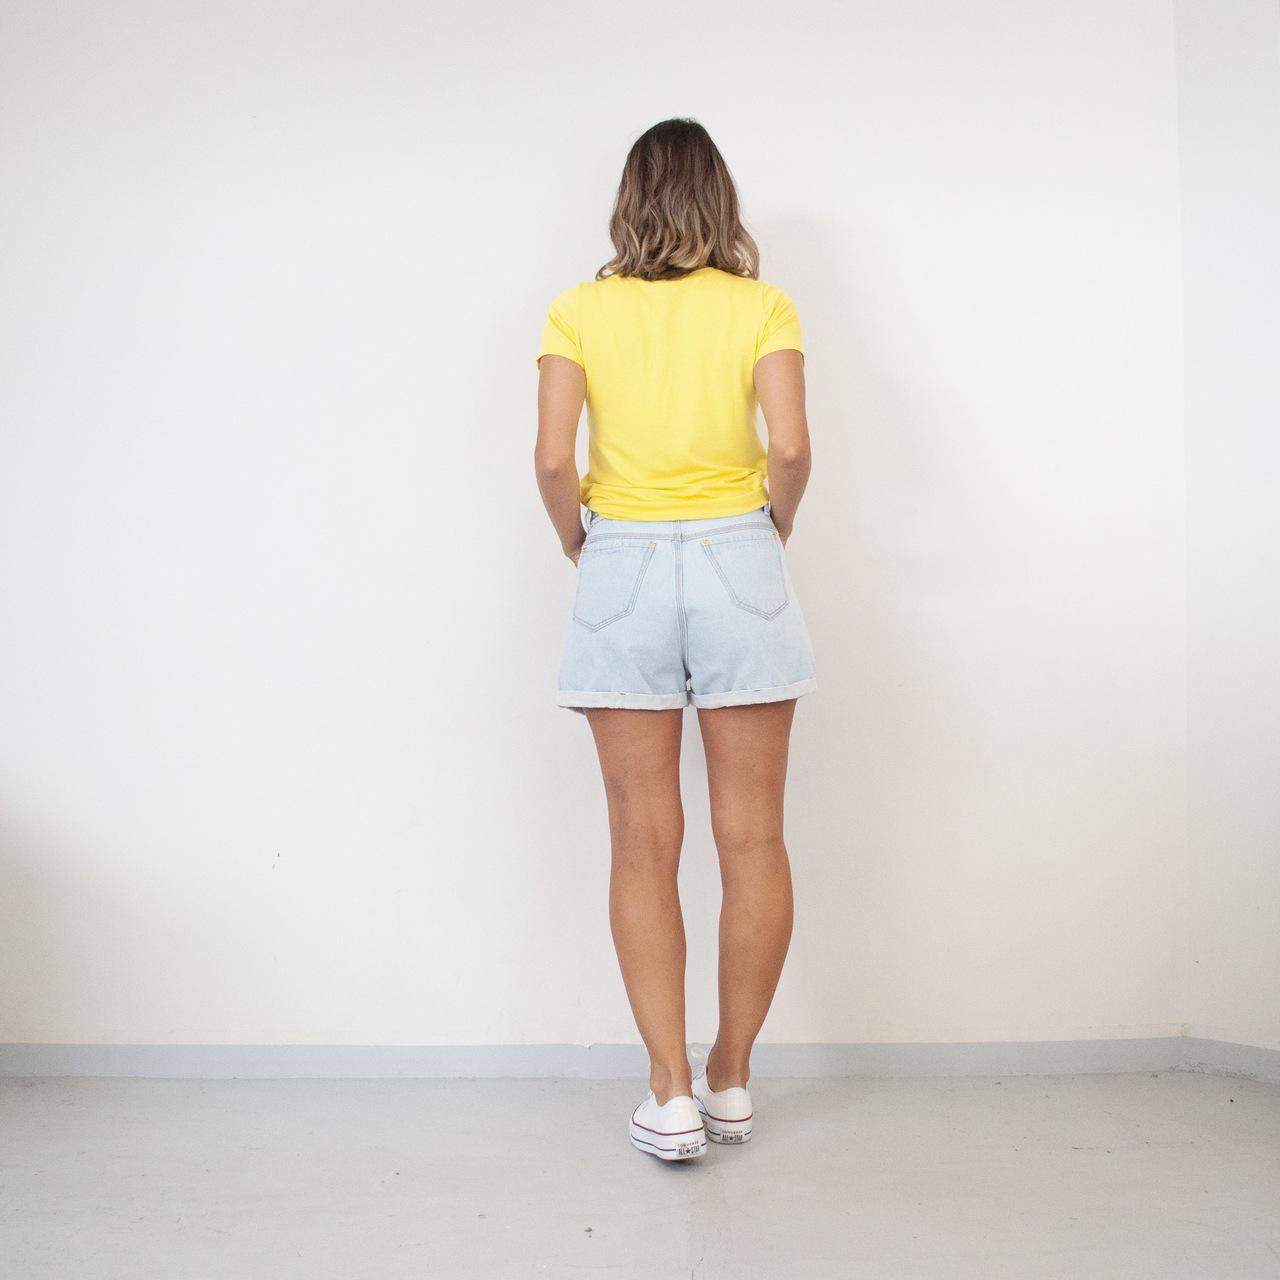 T-Shirt Viscolycra Gola U - Love - Amarelo